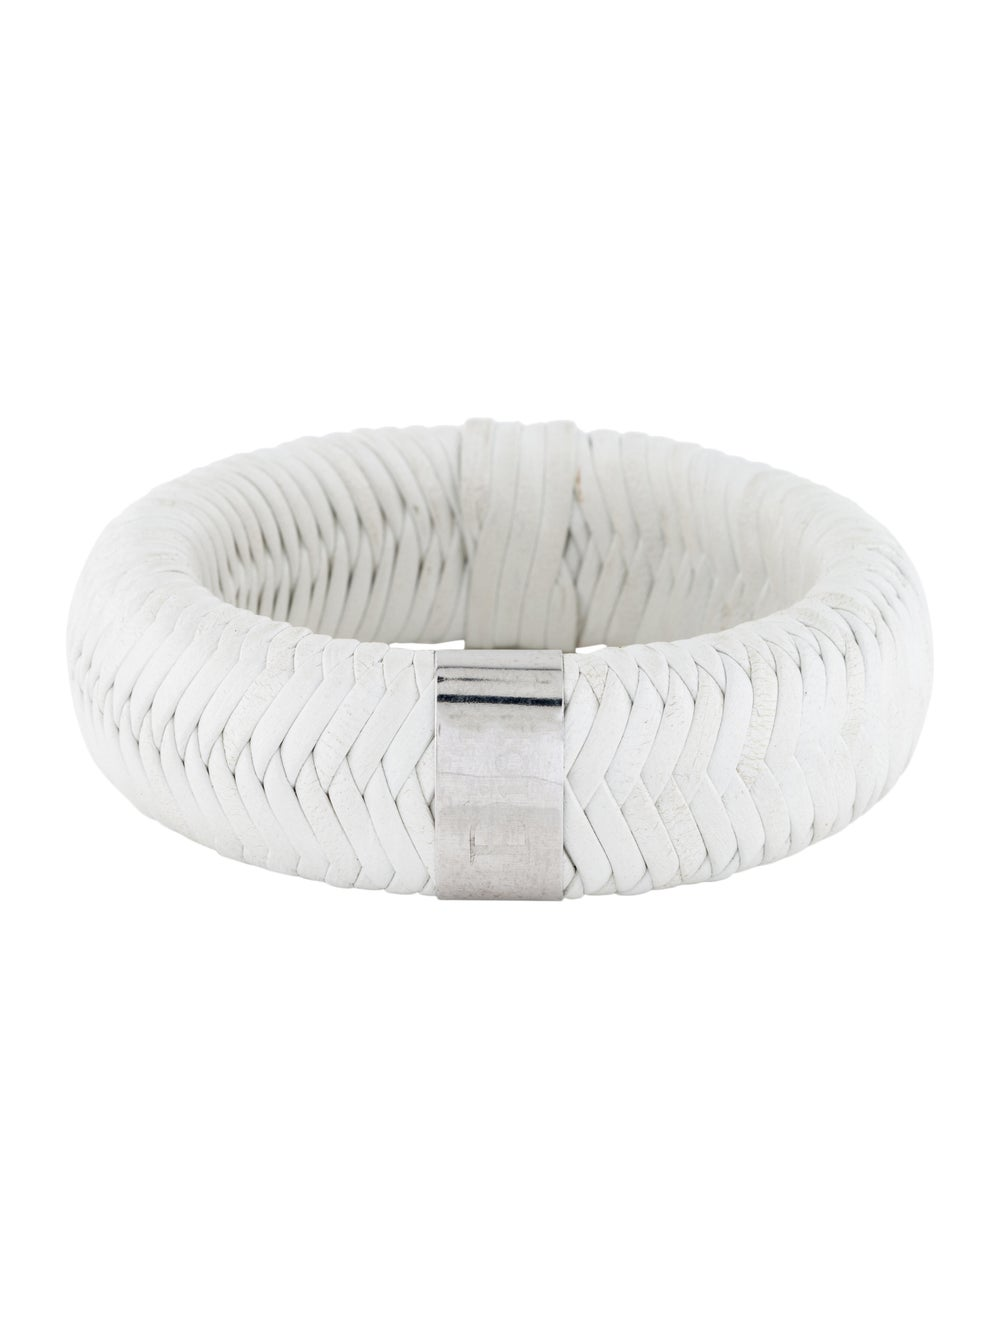 Christian Dior Woven Leather Logo Bangle Silver - image 1